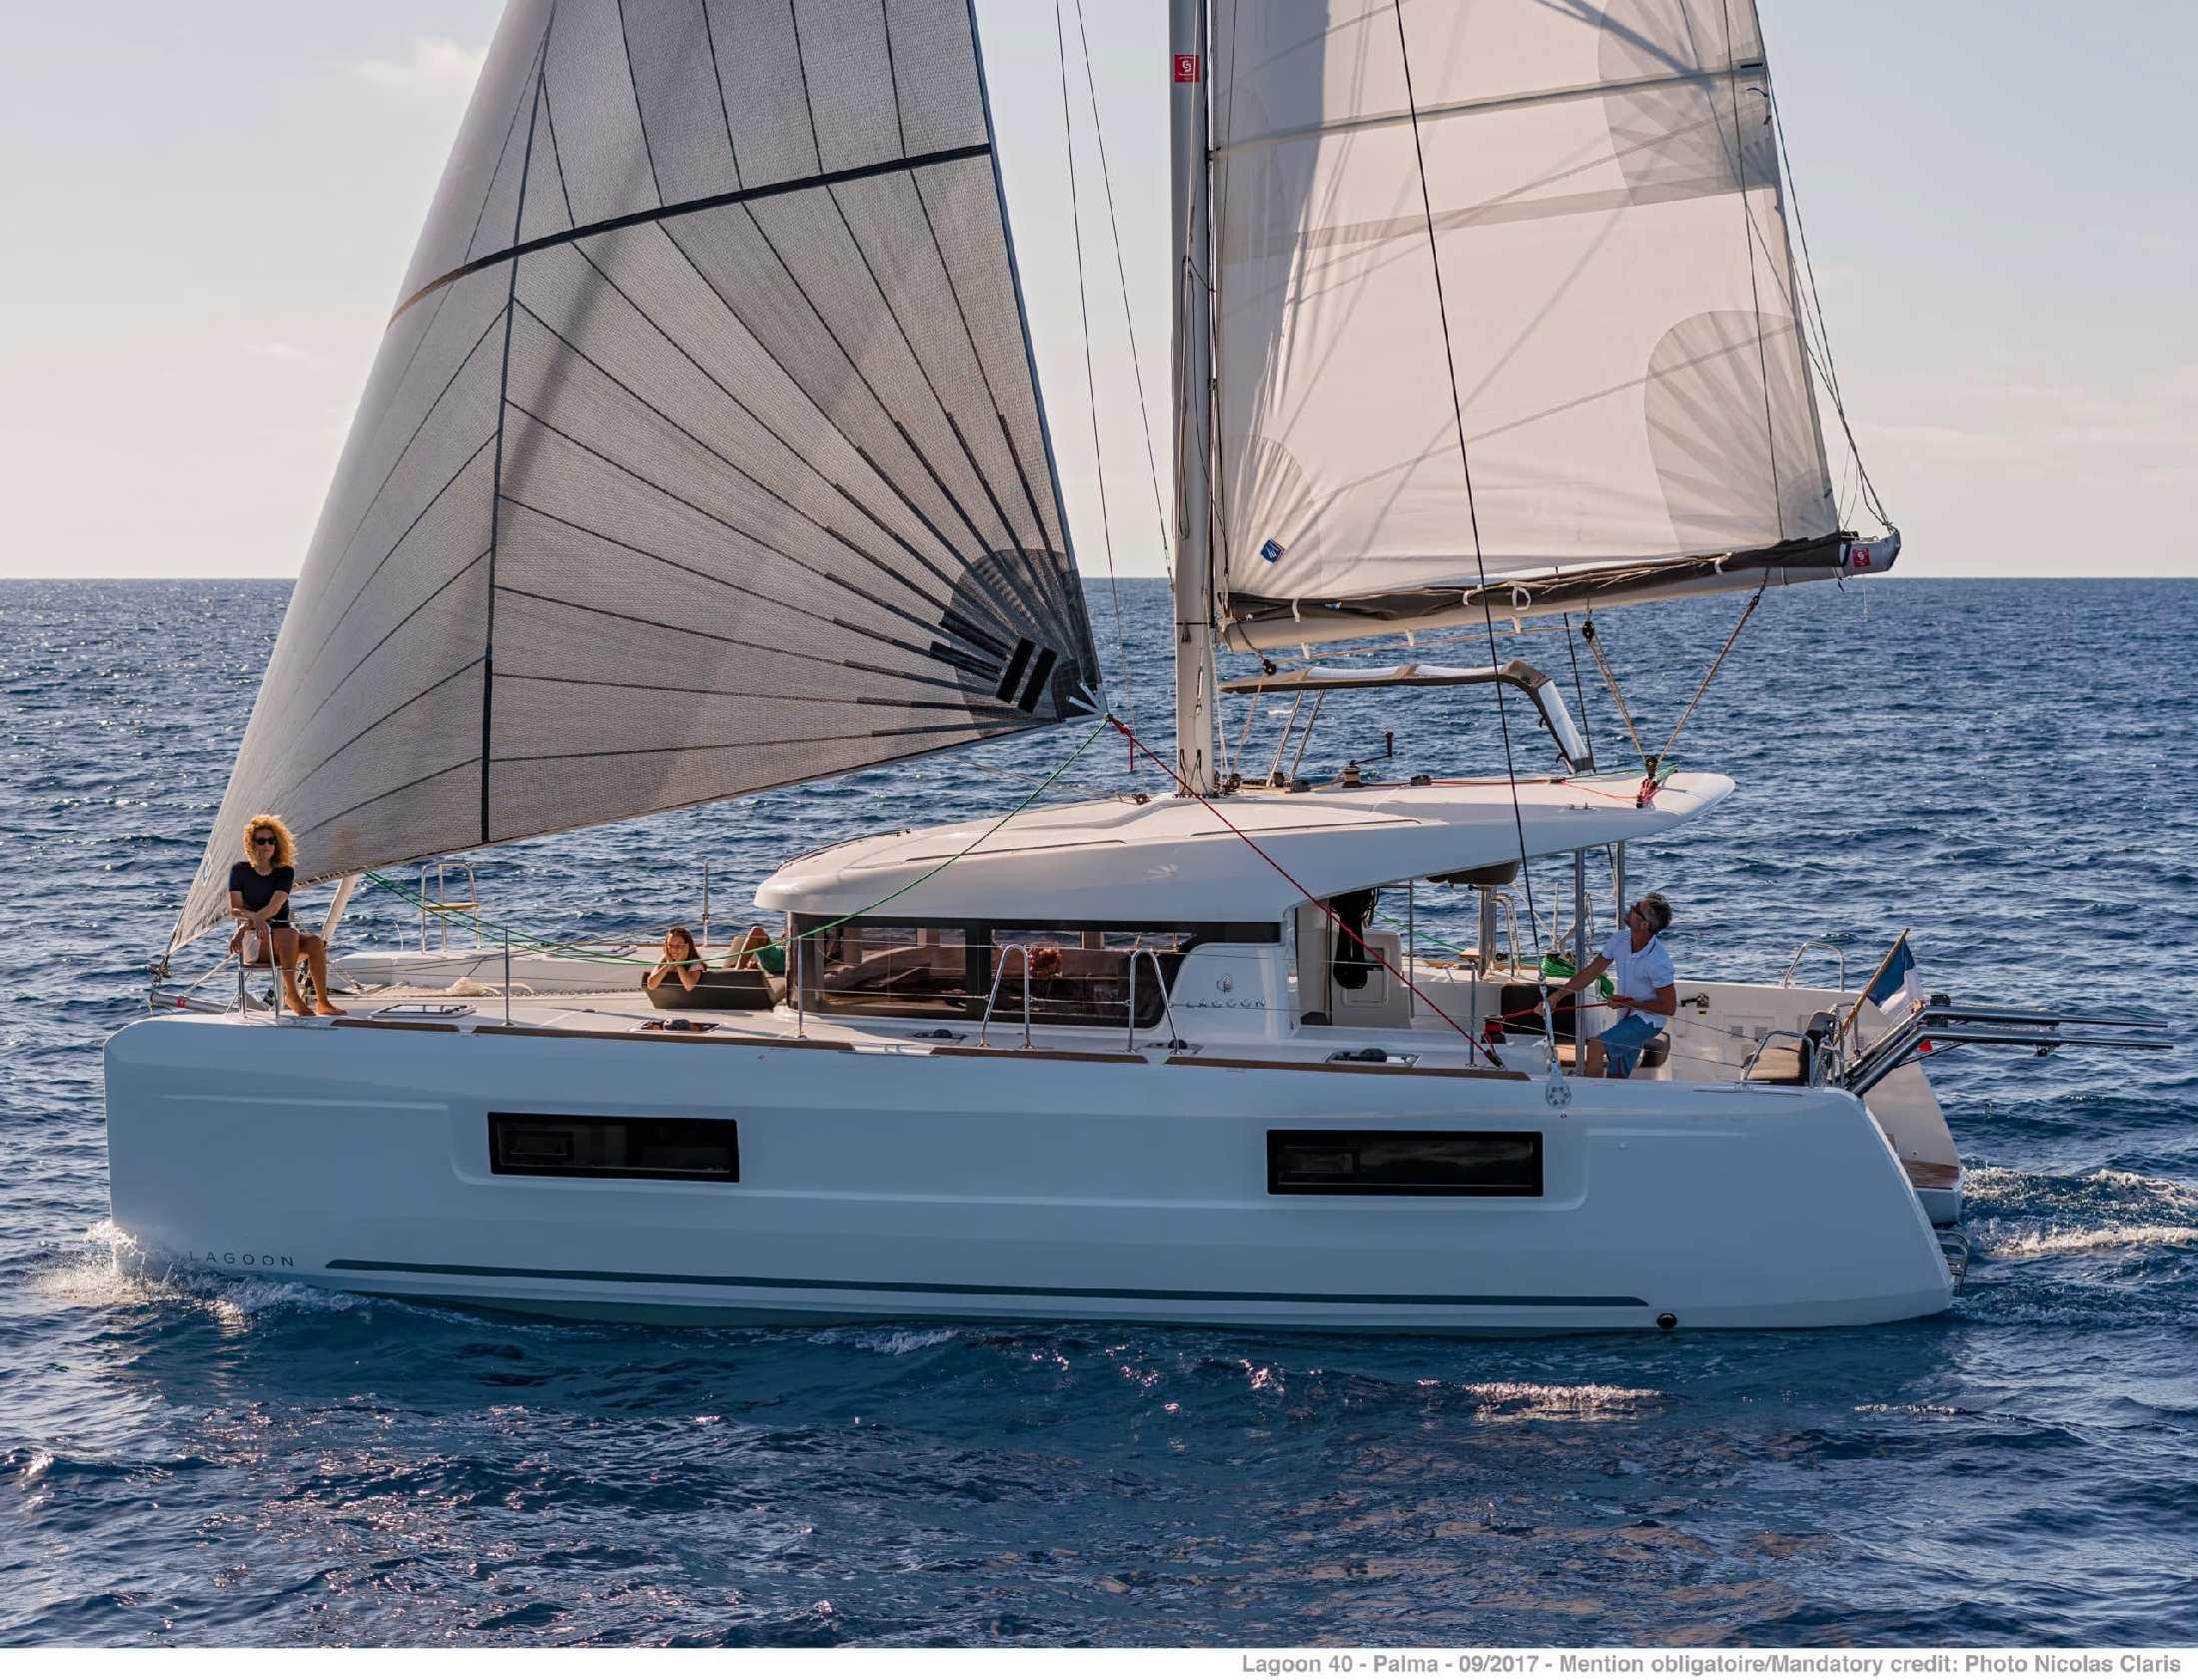 Owner, Lagoon 380